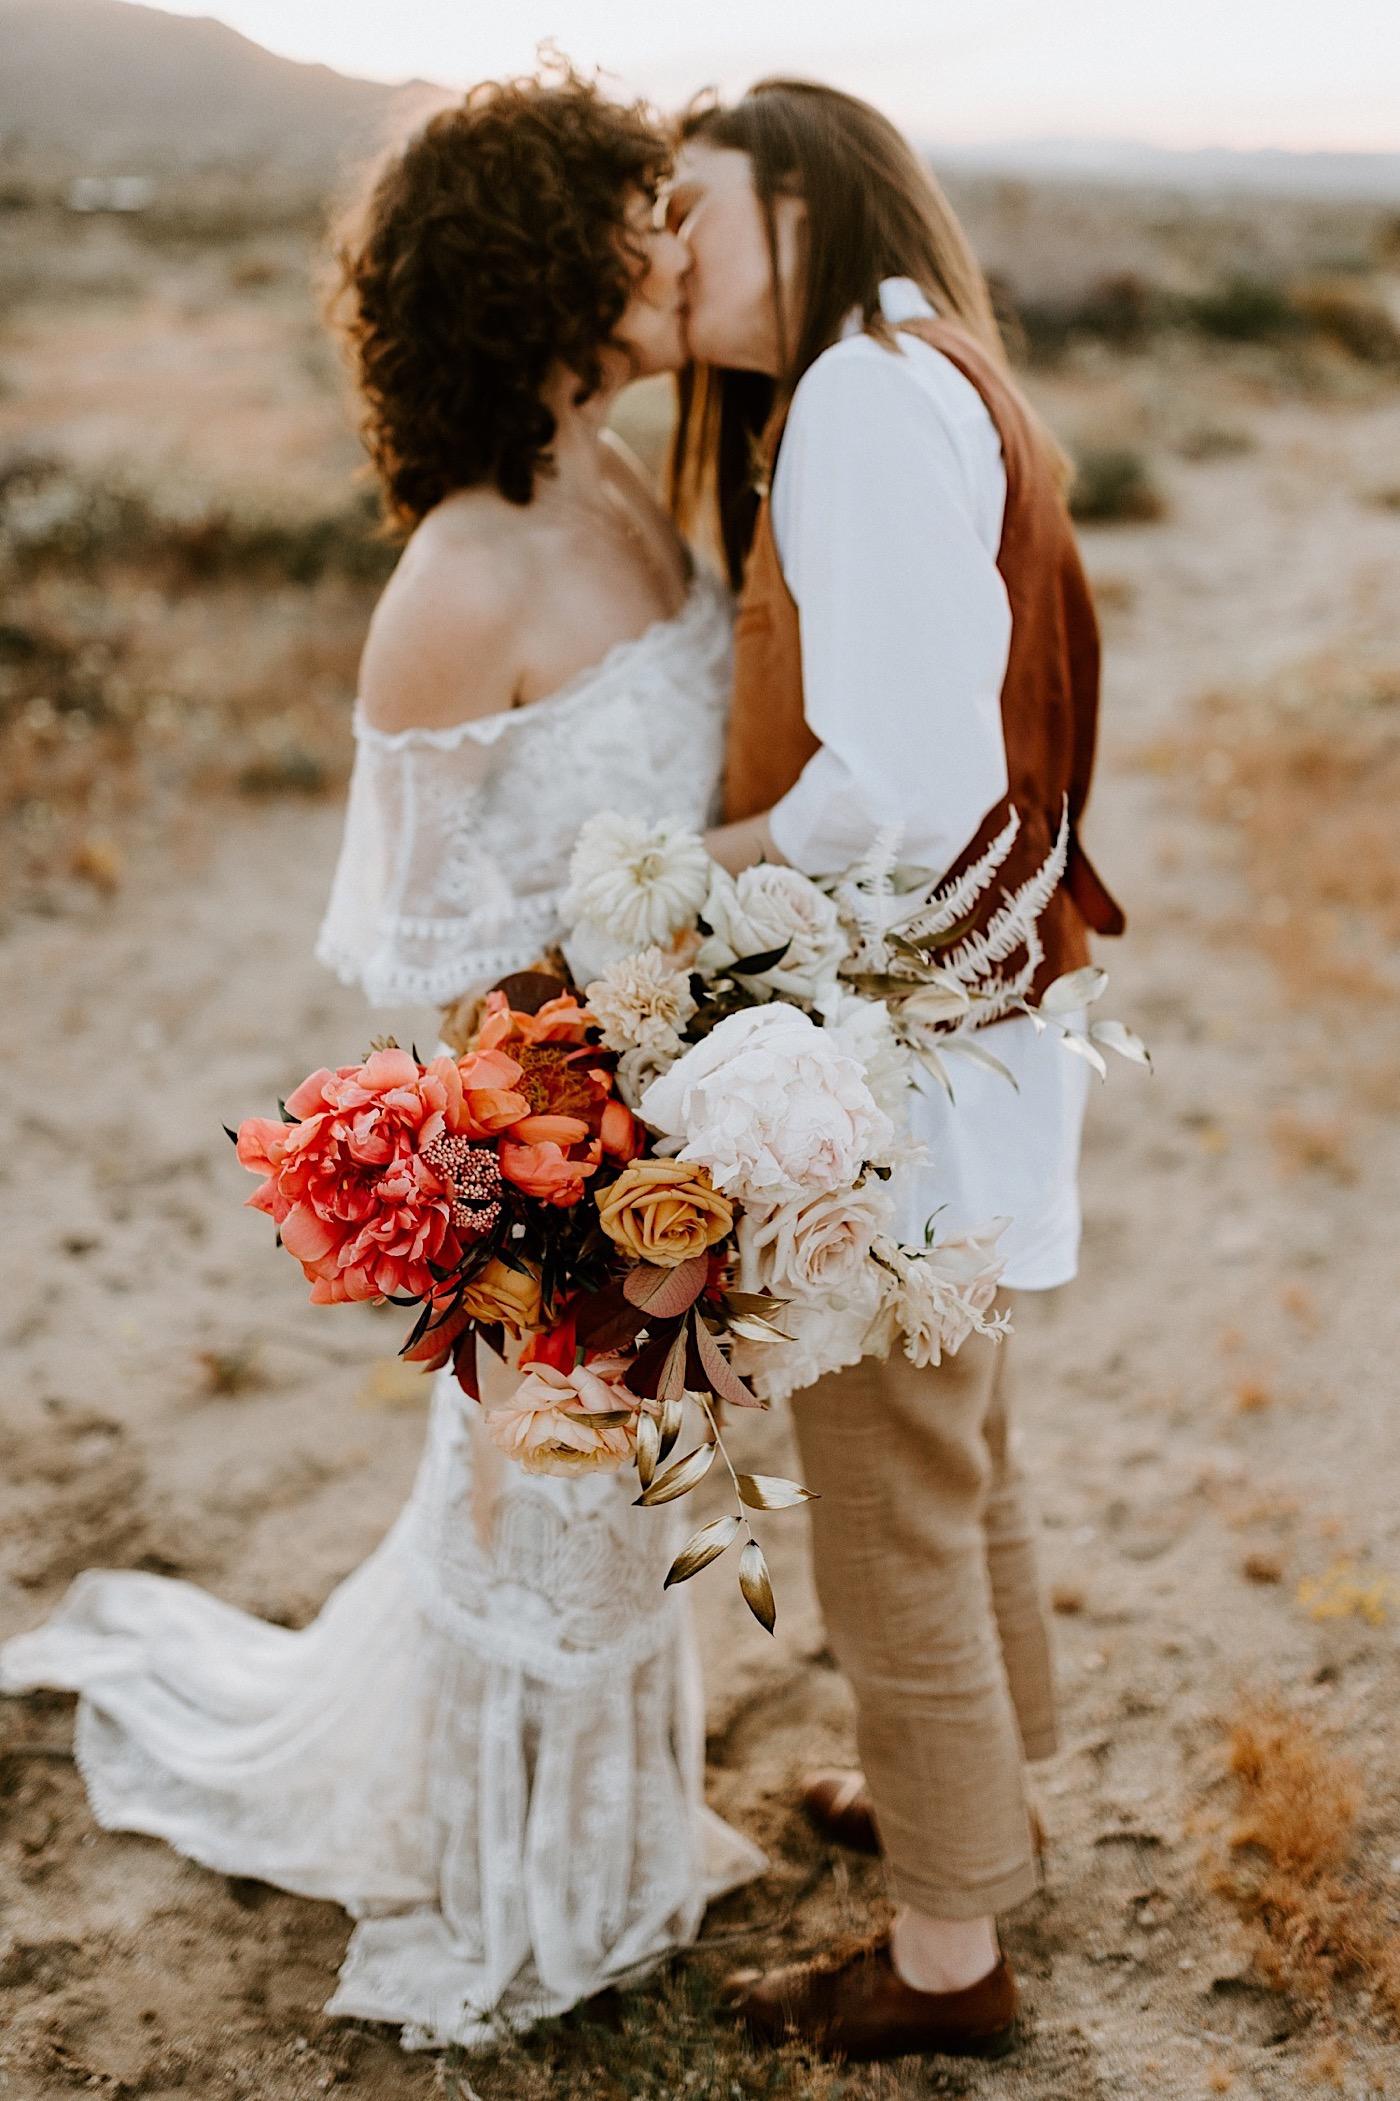 Joshua Tree Same Sex Wedding Joshua Tree Wedding Photographer Palm Springs Wedding Photographer 46